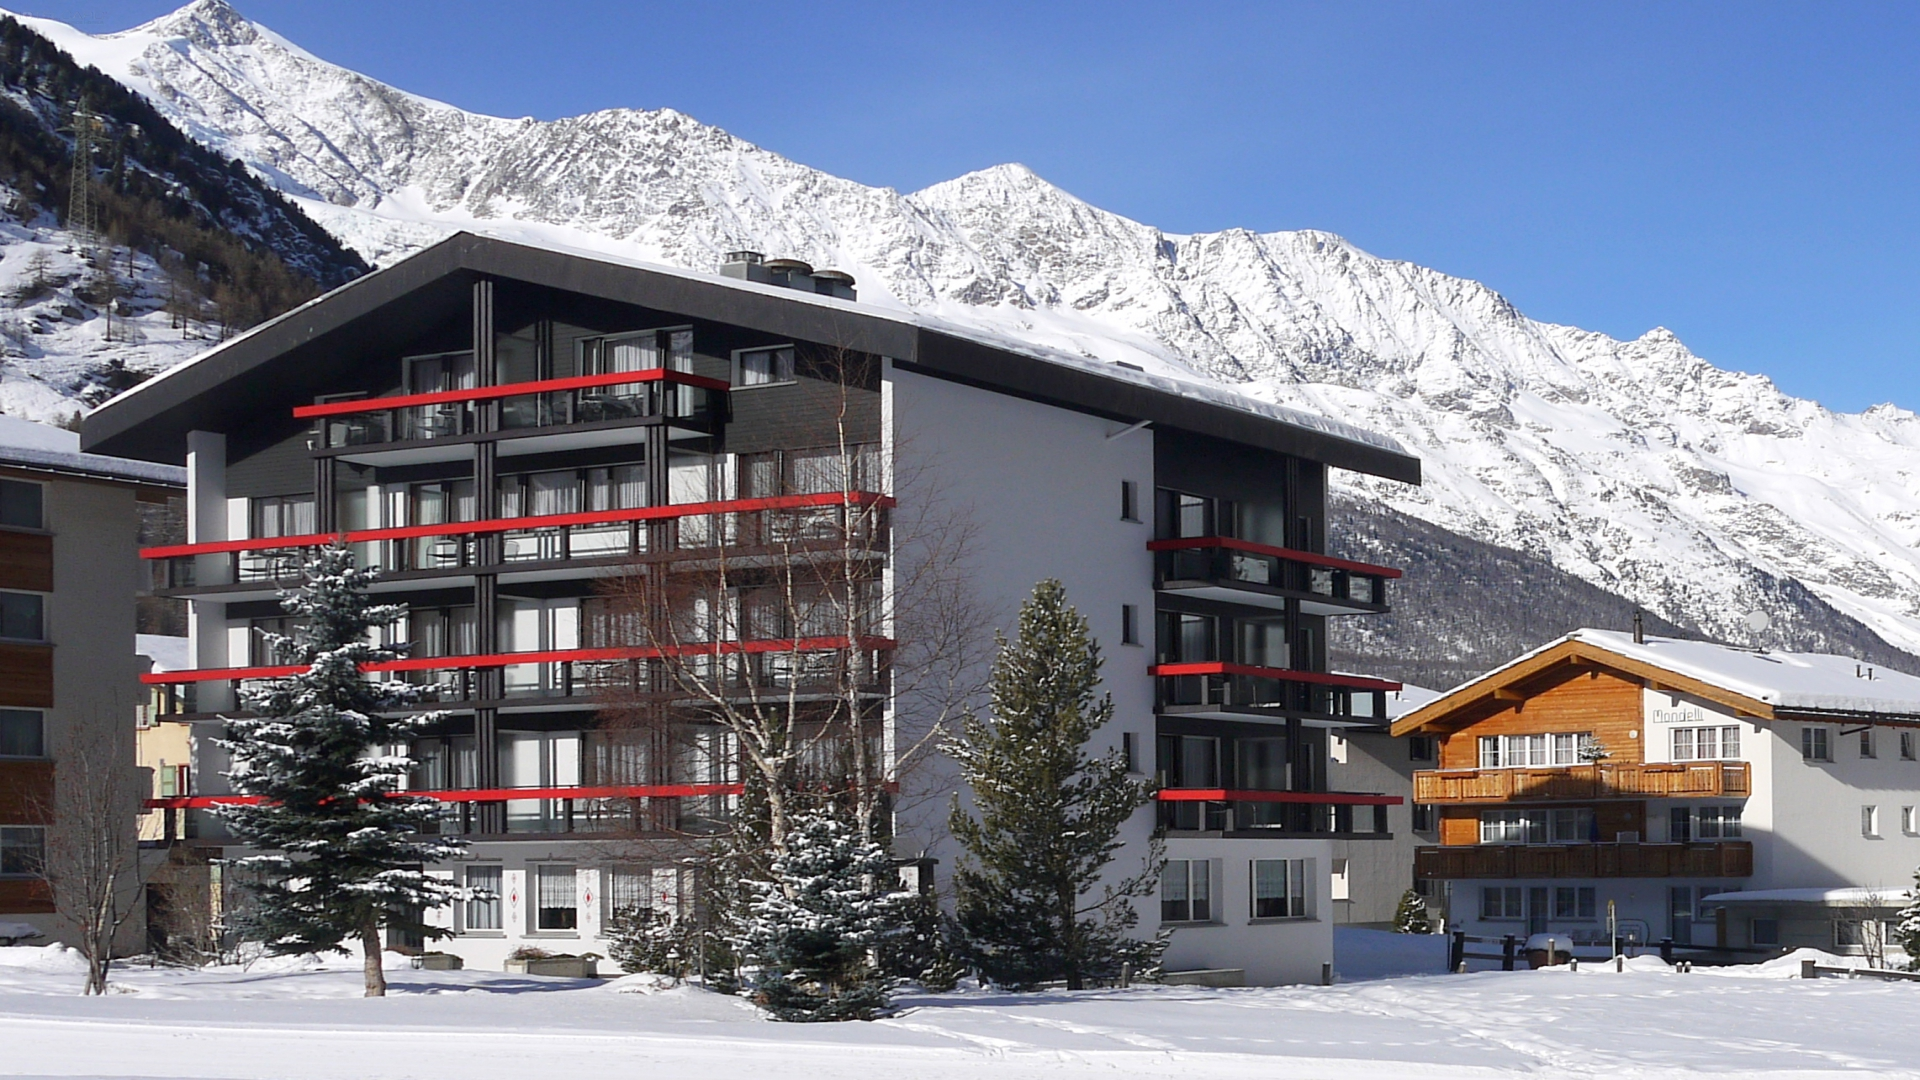 Wohlfühlhotel Hotel Alpenhof 1